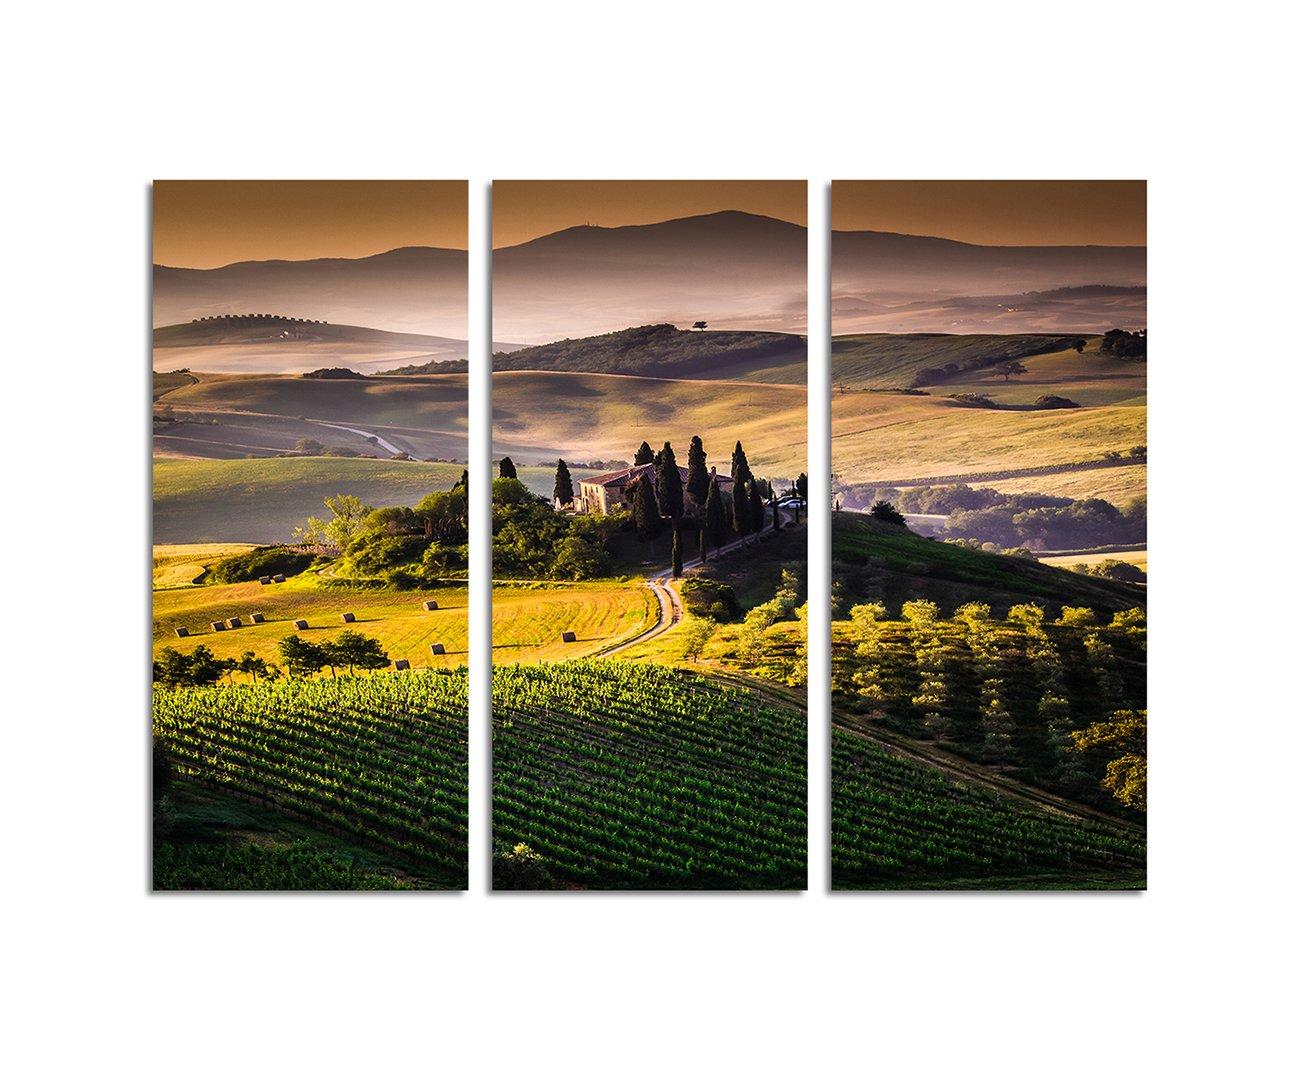 130x90cm – KUNSTDRUCK Toskana Italien Landschaft Anwesen 3teiliges Wandbild auf Leinwand und Keilrahmen - Fotobild Kunstdruck Artprint Paul Sinus Art